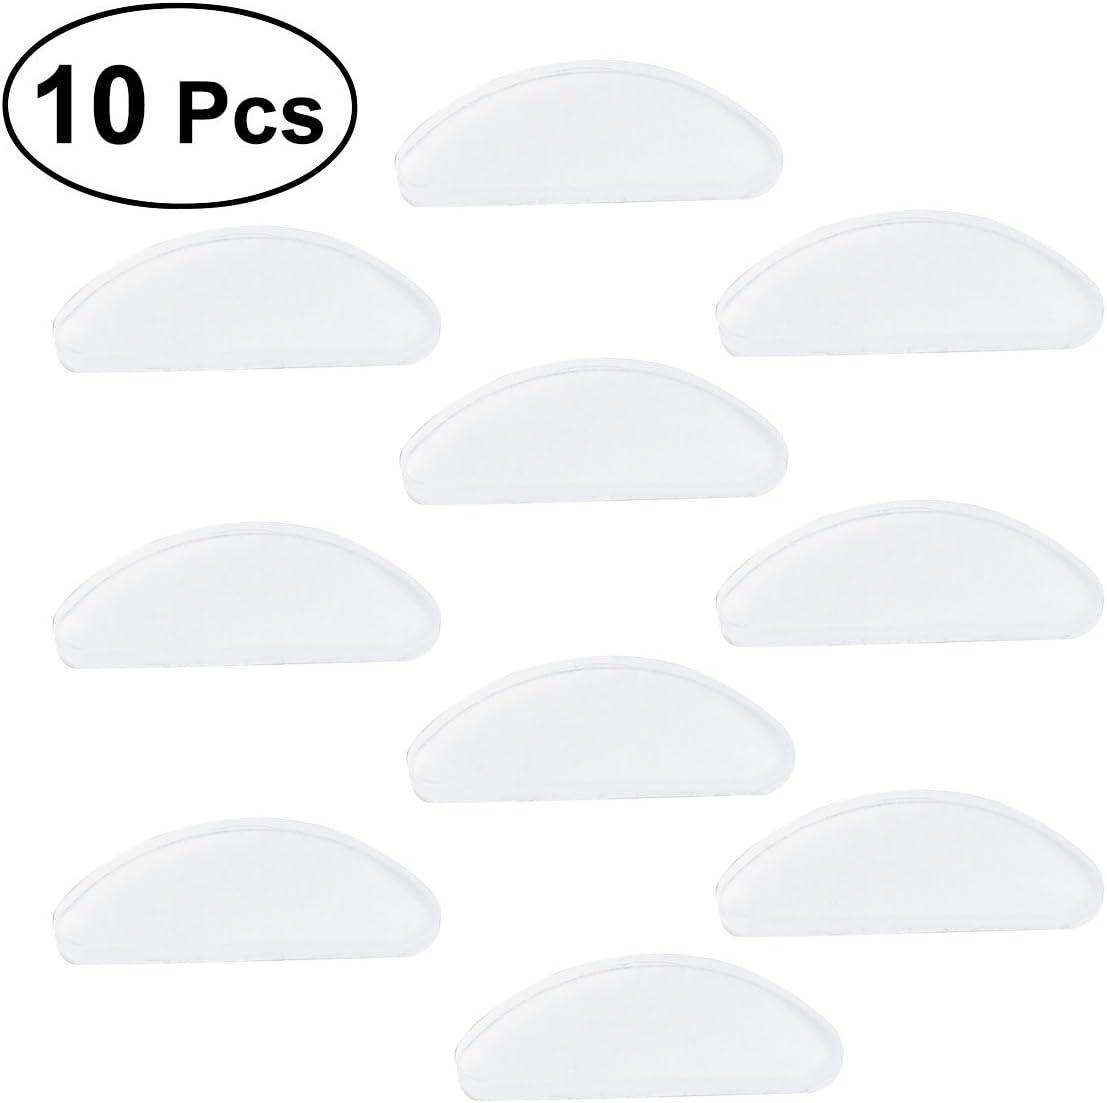 rosenice Protector de nariz de gafas vasos adhesivos de silicona antideslizante Nose Pads 10pcs (blanco)